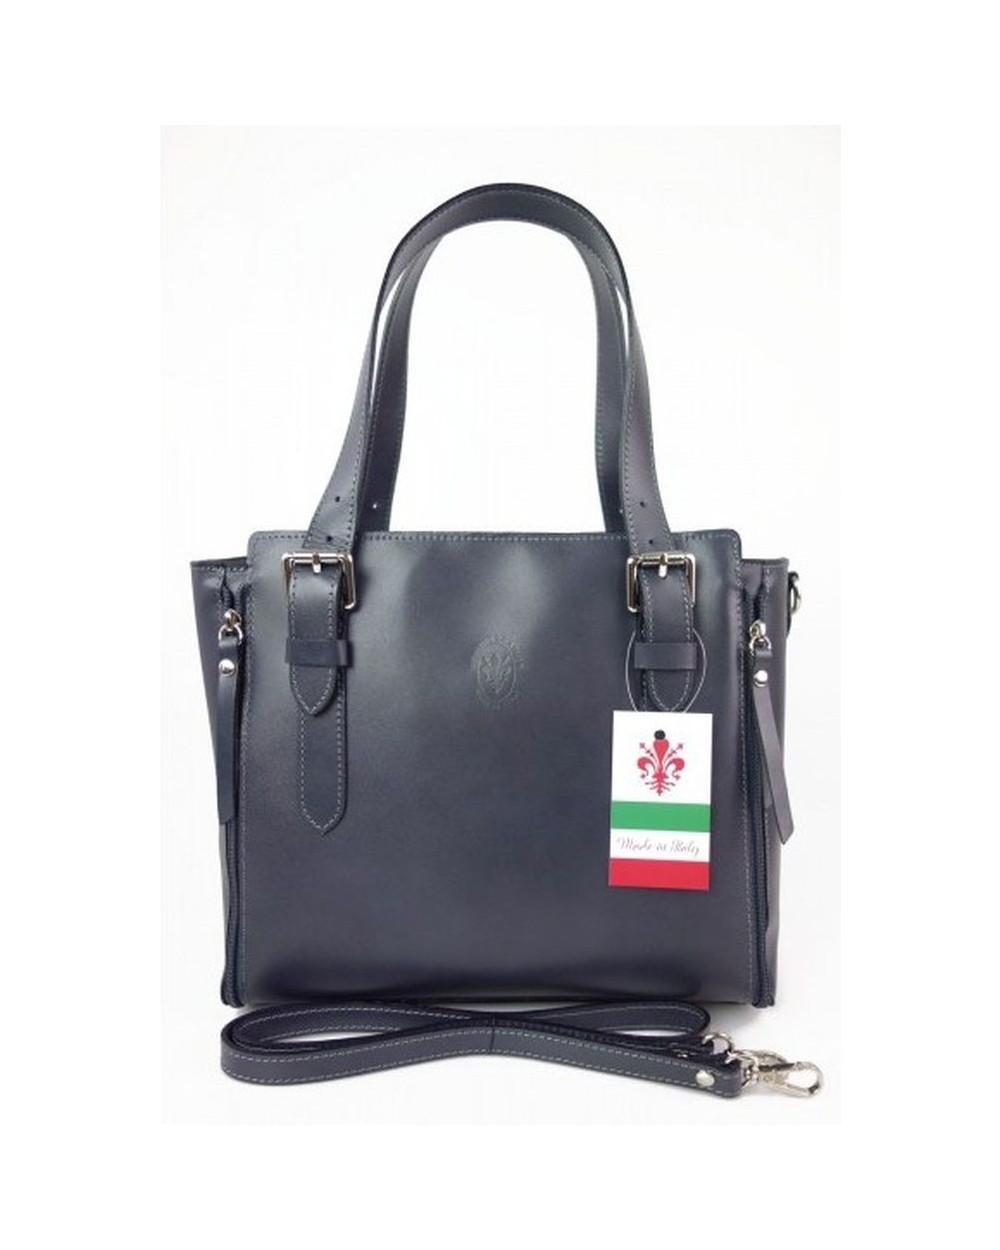 Włoska torba skórzana shopperka kuferek szara